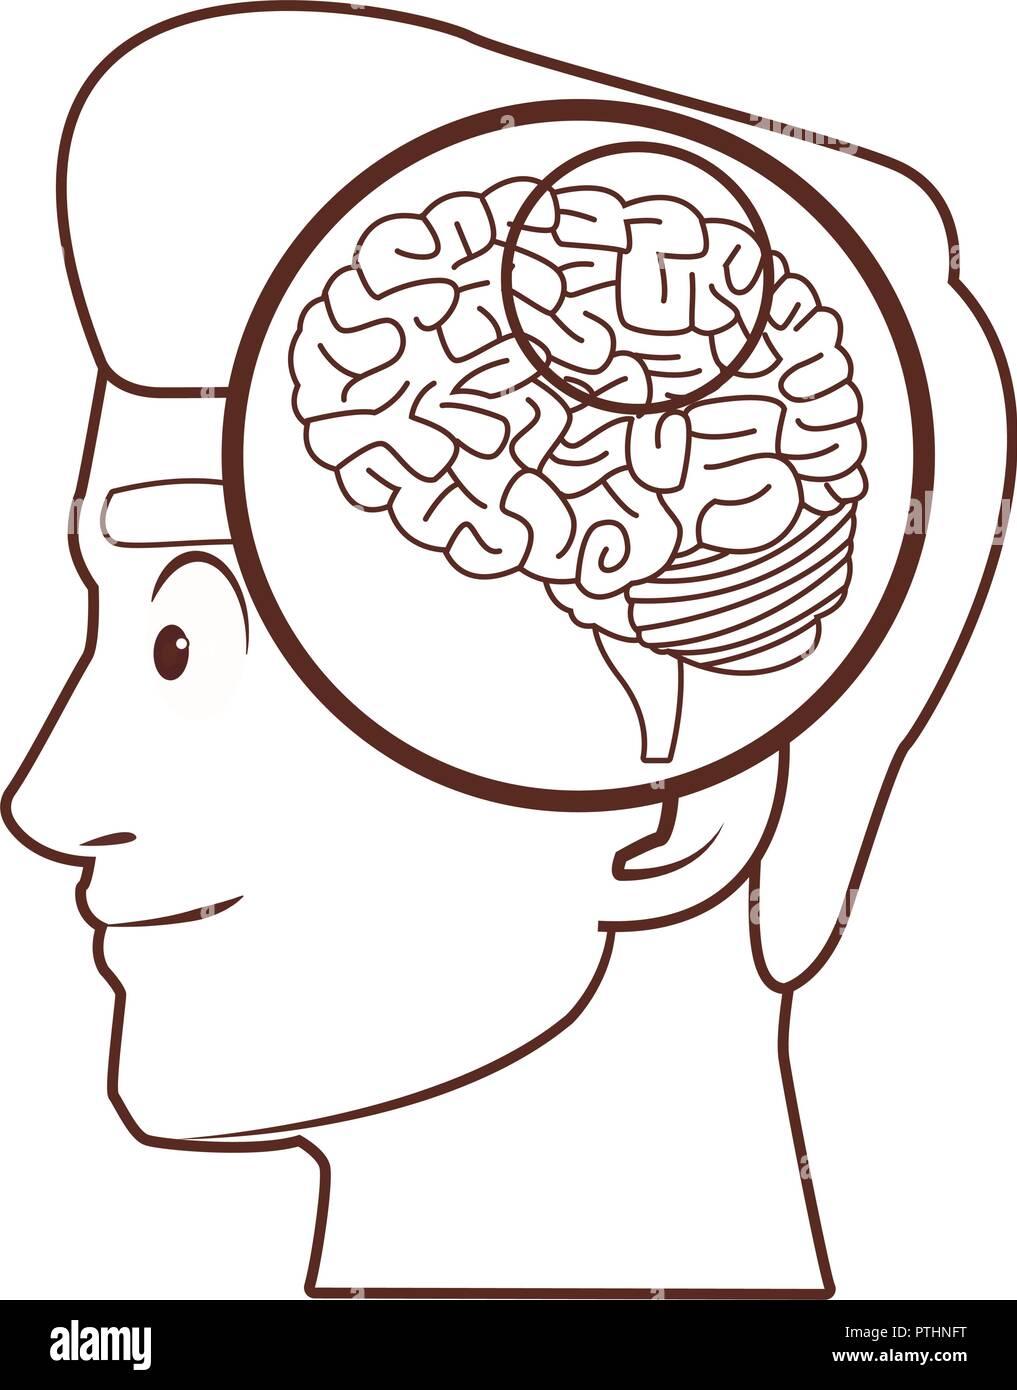 Old man alzheimer brain - Stock Vector